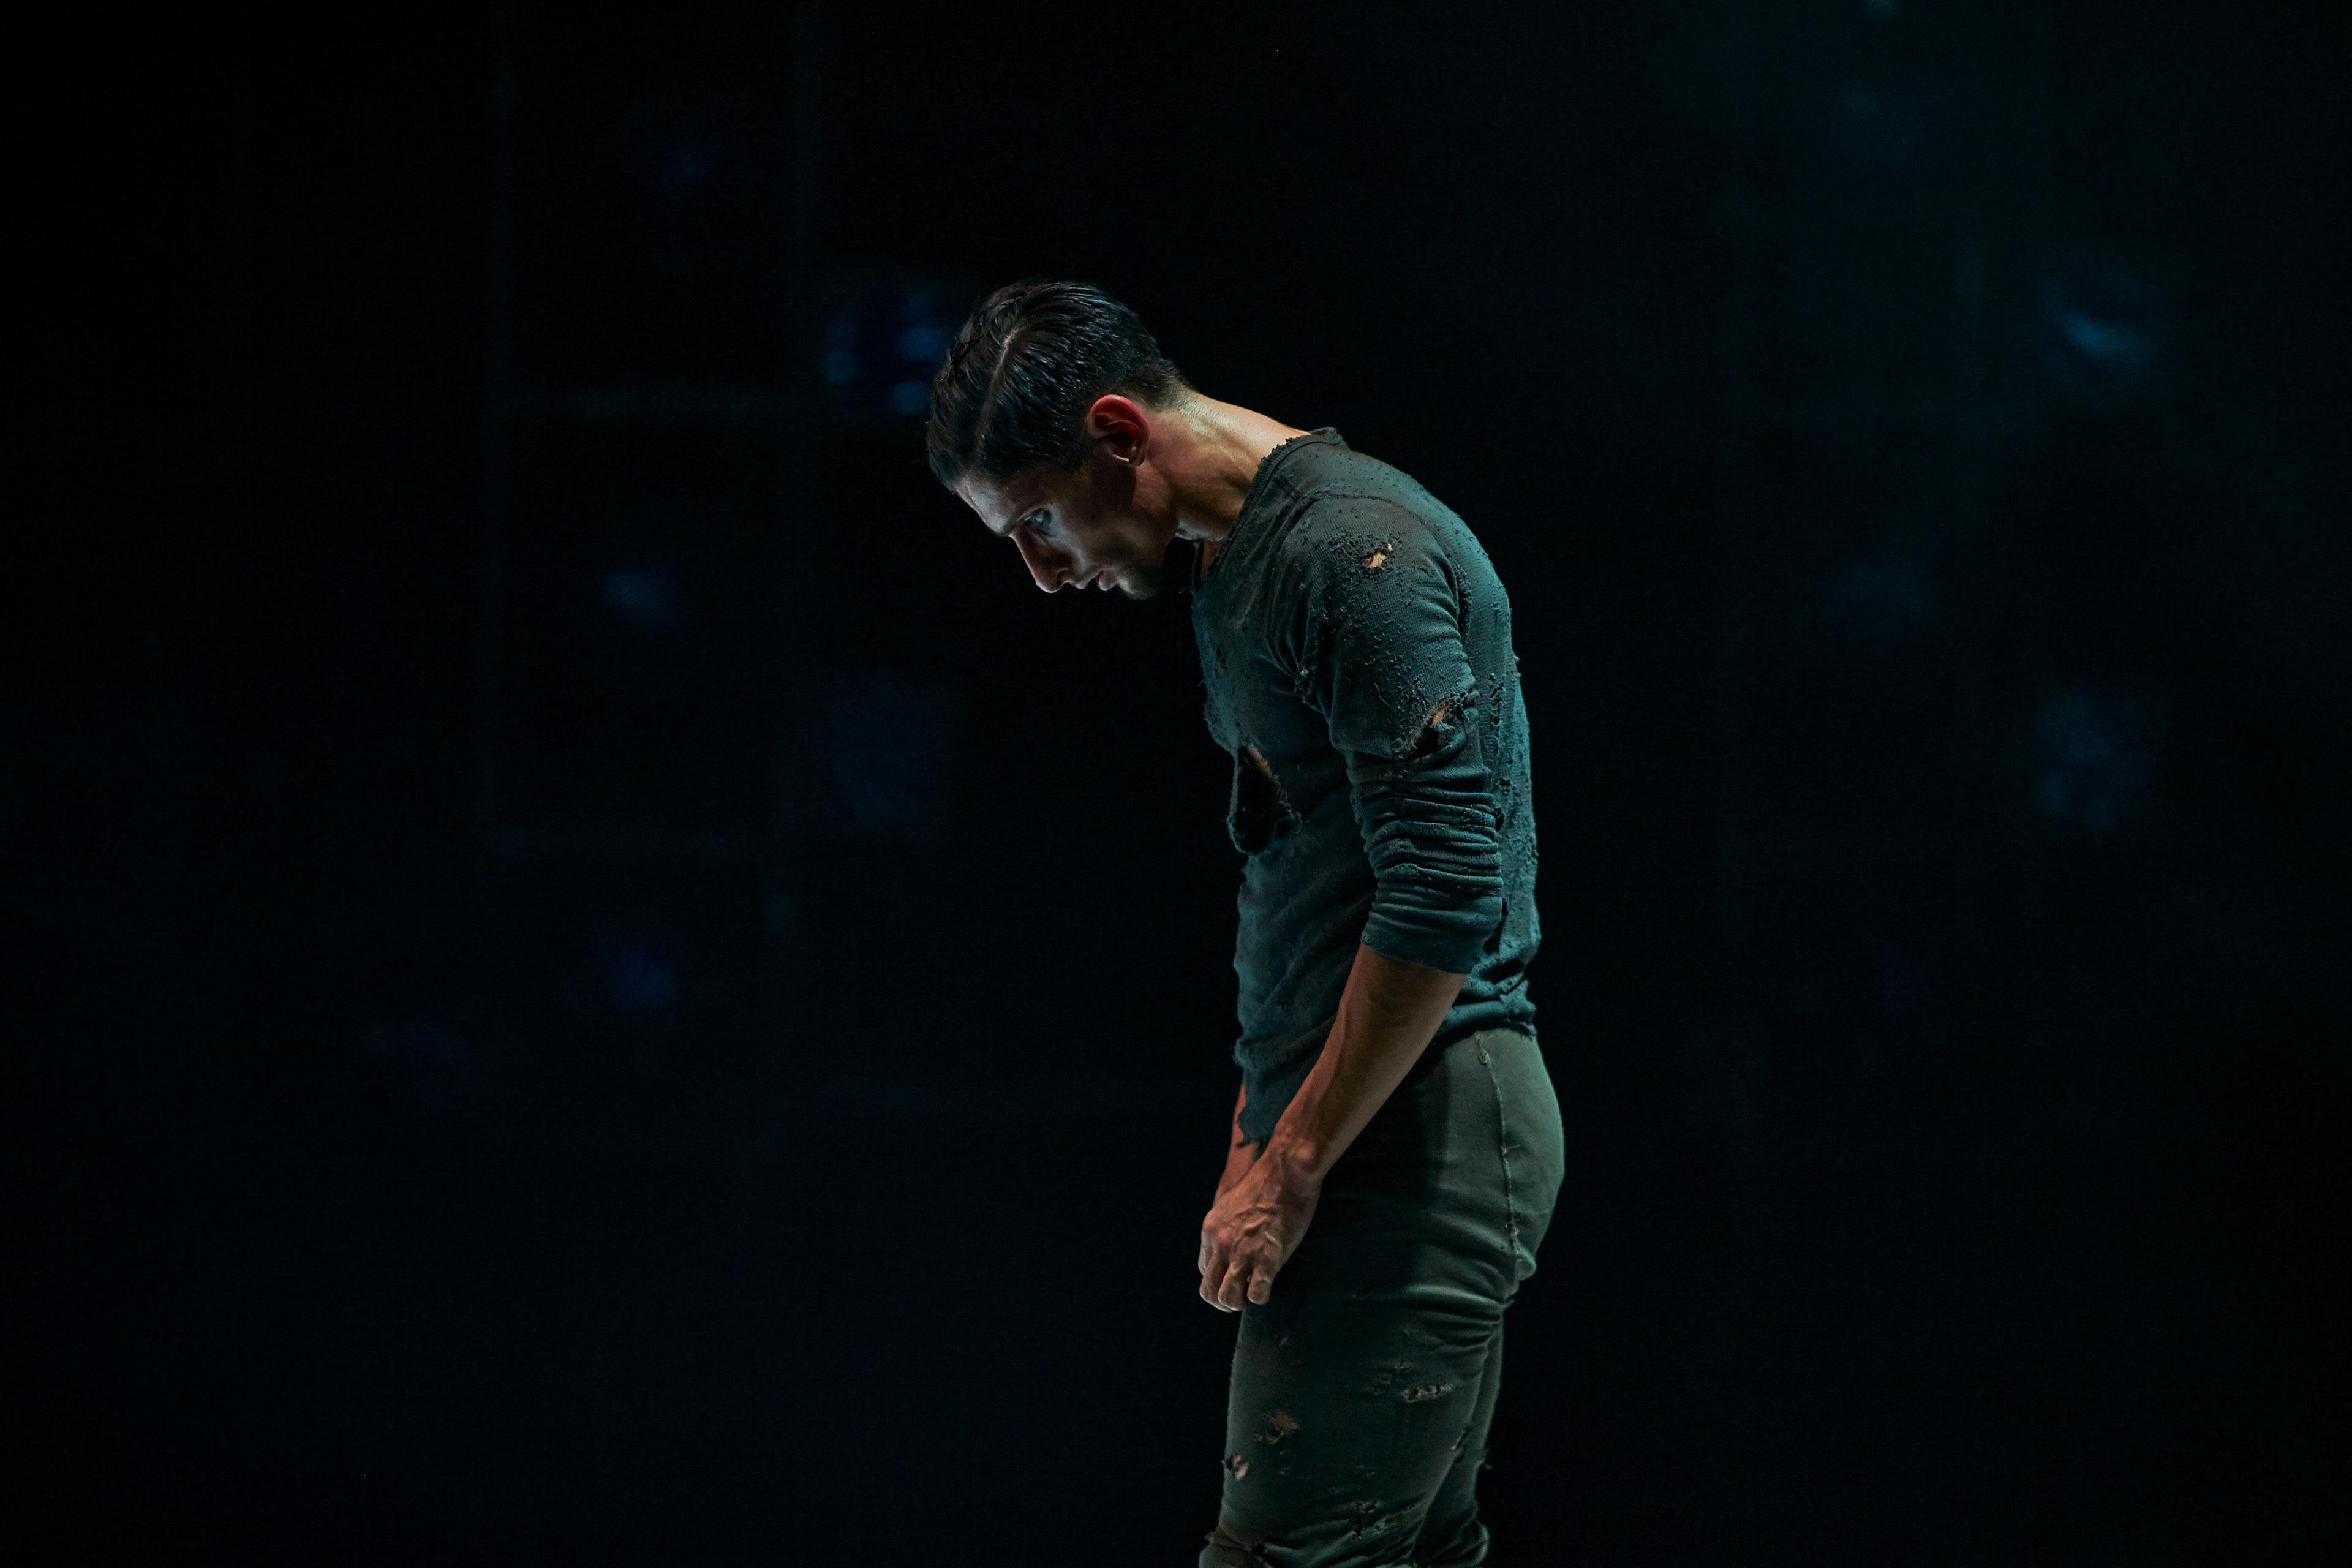 Richard Moran Dance Music Performance 028